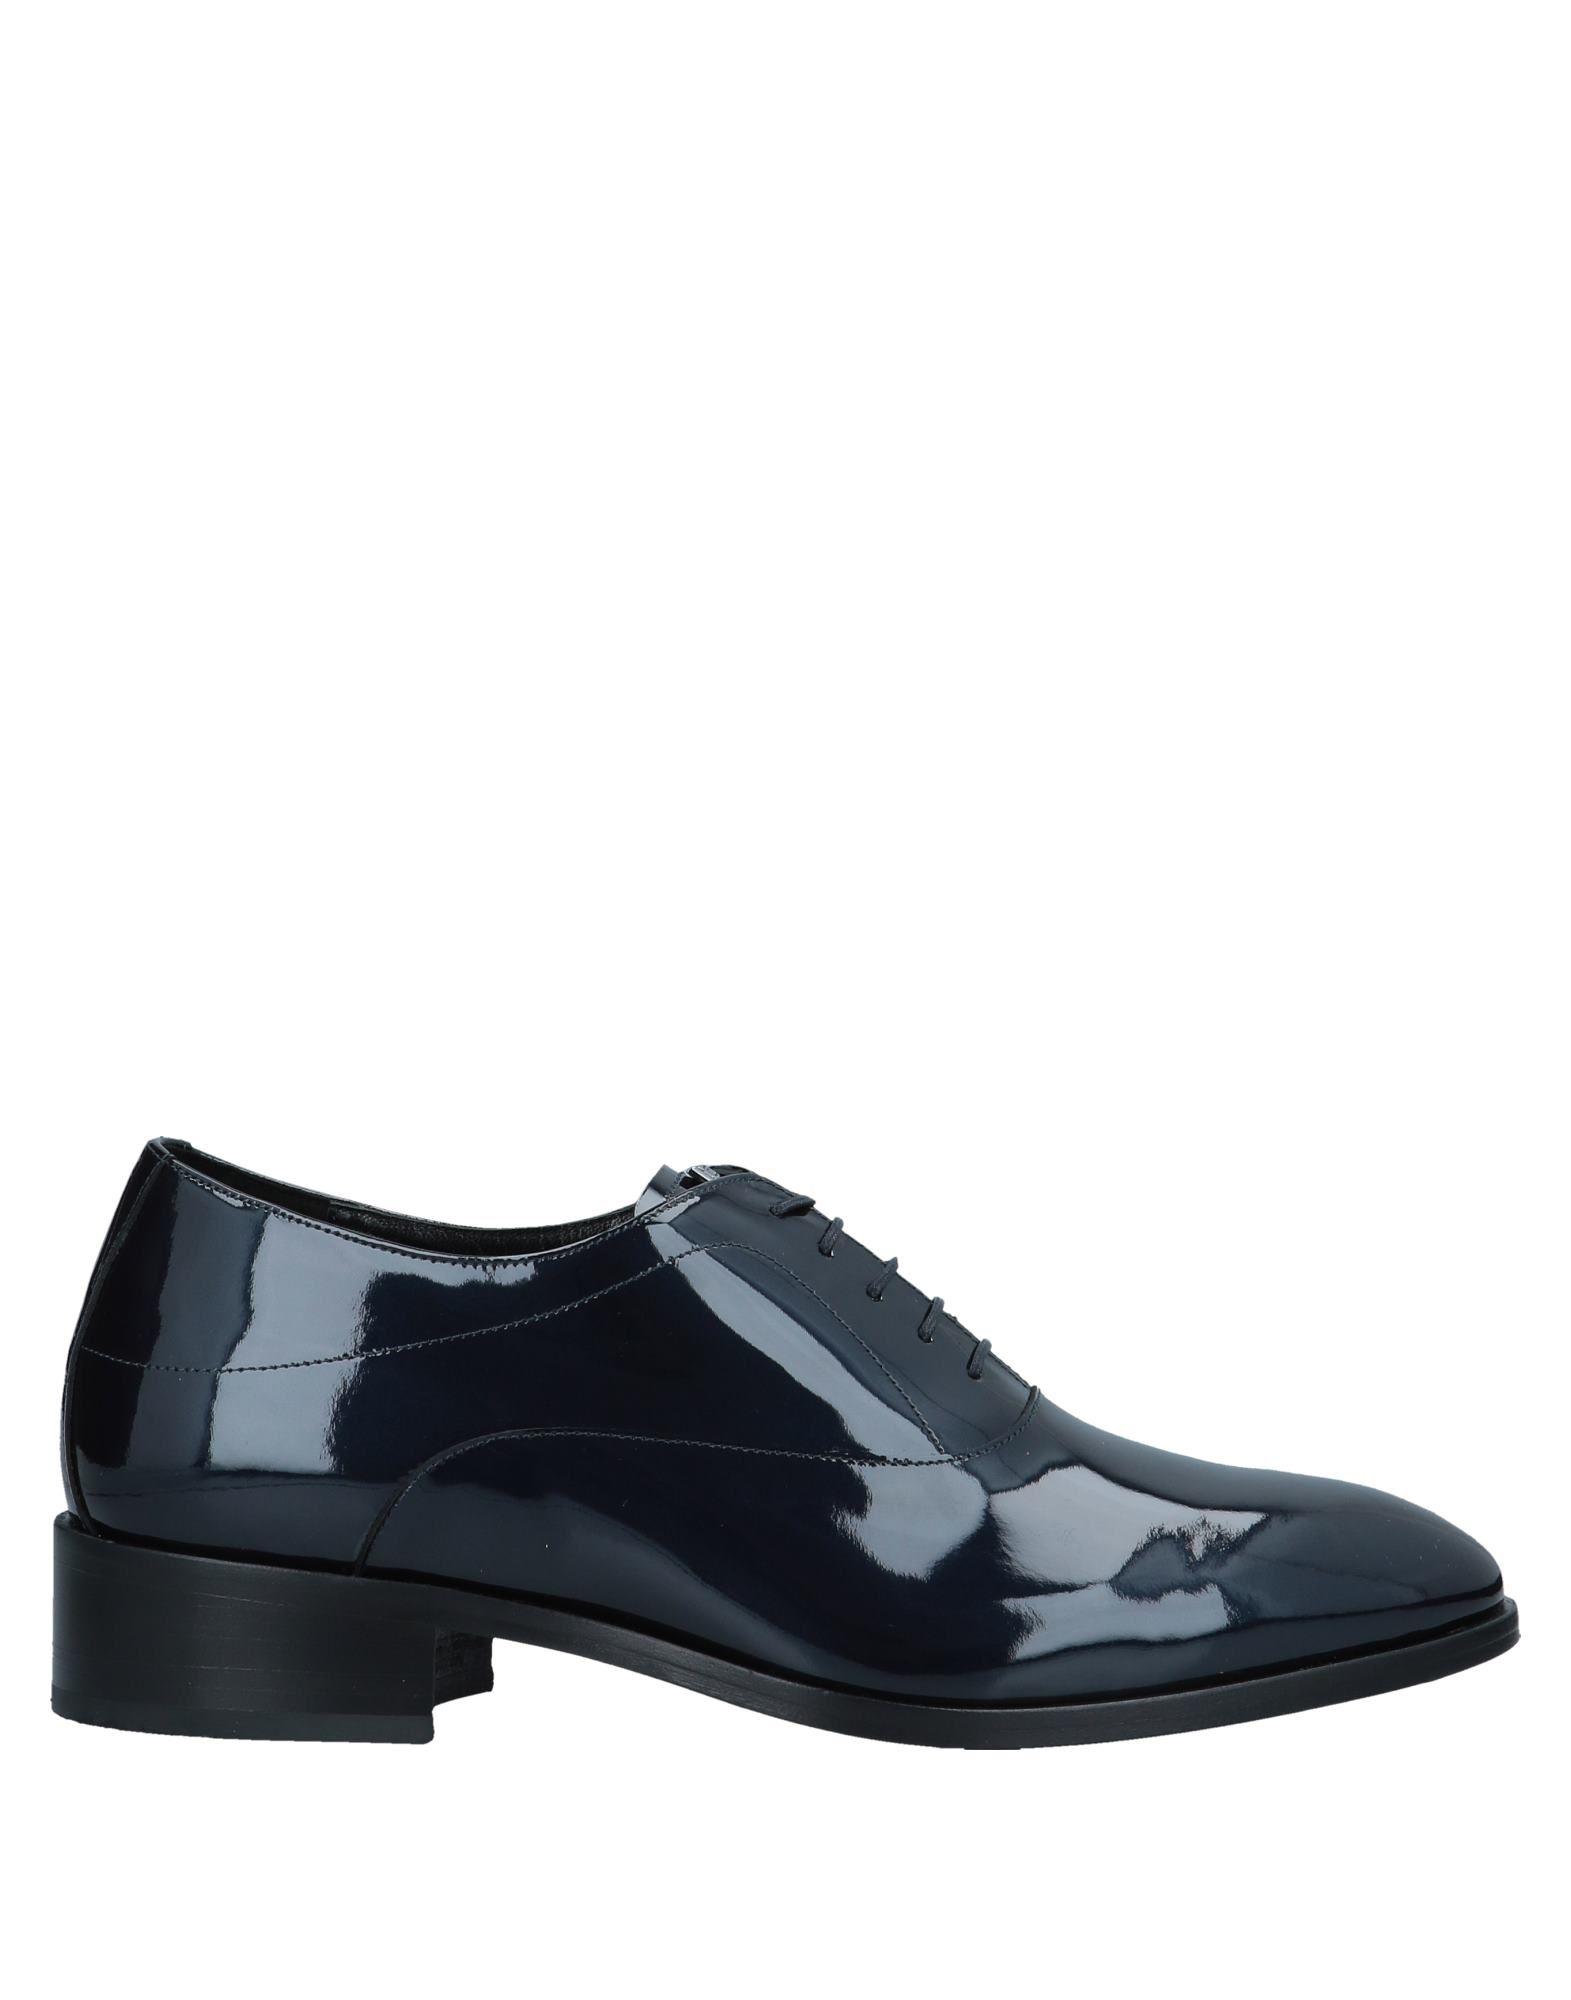 CALZOLERIA MARINI dal 1945 Обувь на шнурках